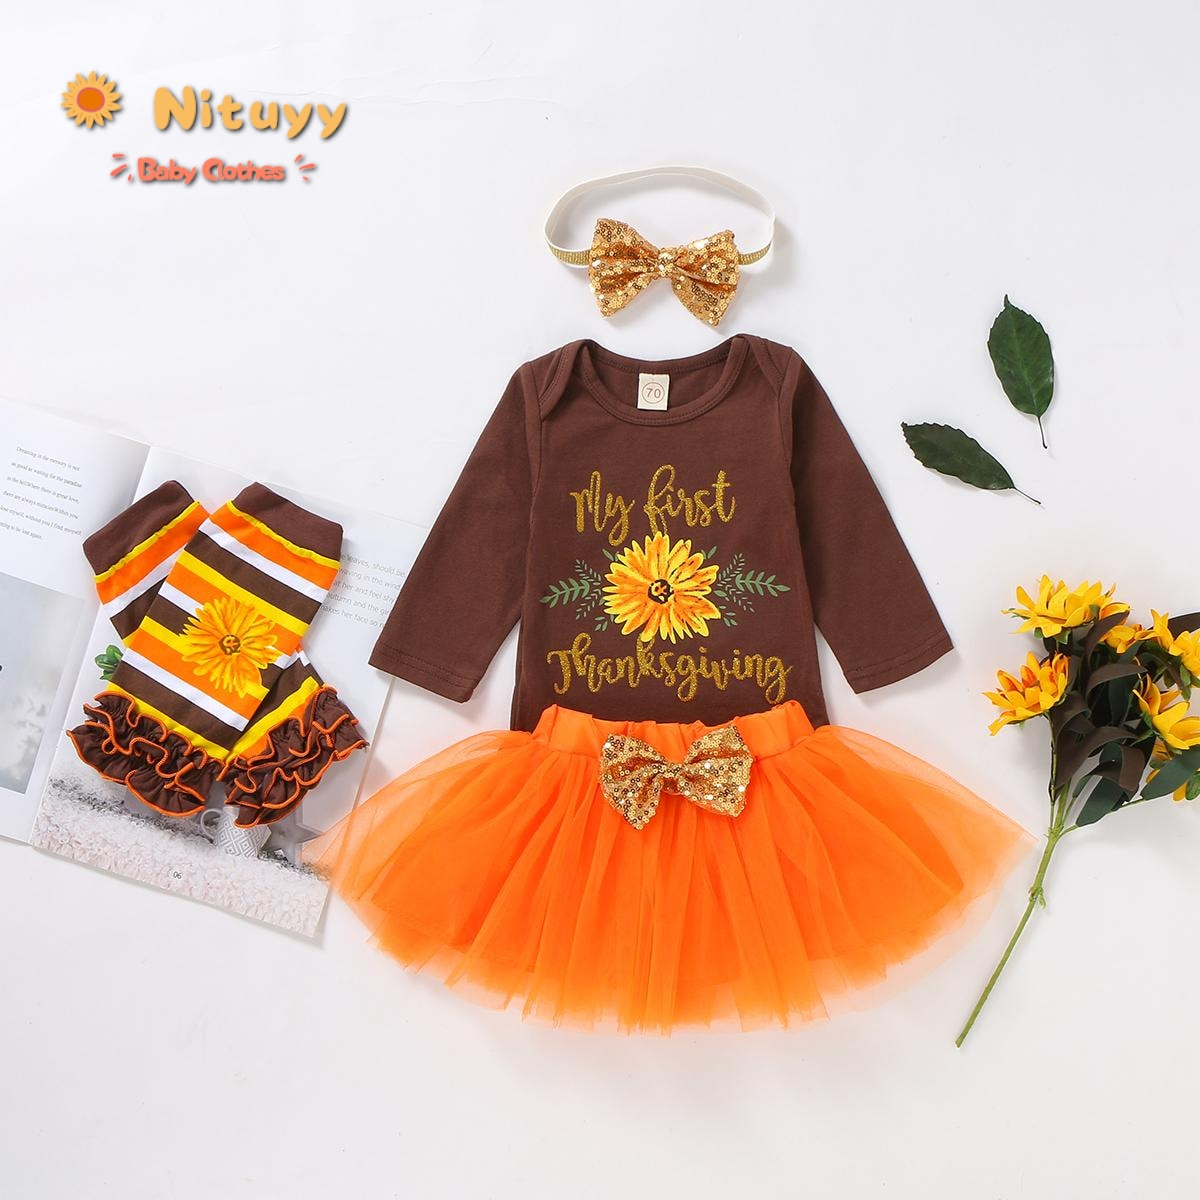 2020 1er traje de Acción de Gracias bebé niña niño 4 Uds letra estampado de girasol manga larga Top body Tutu falda de malla gorro calentador